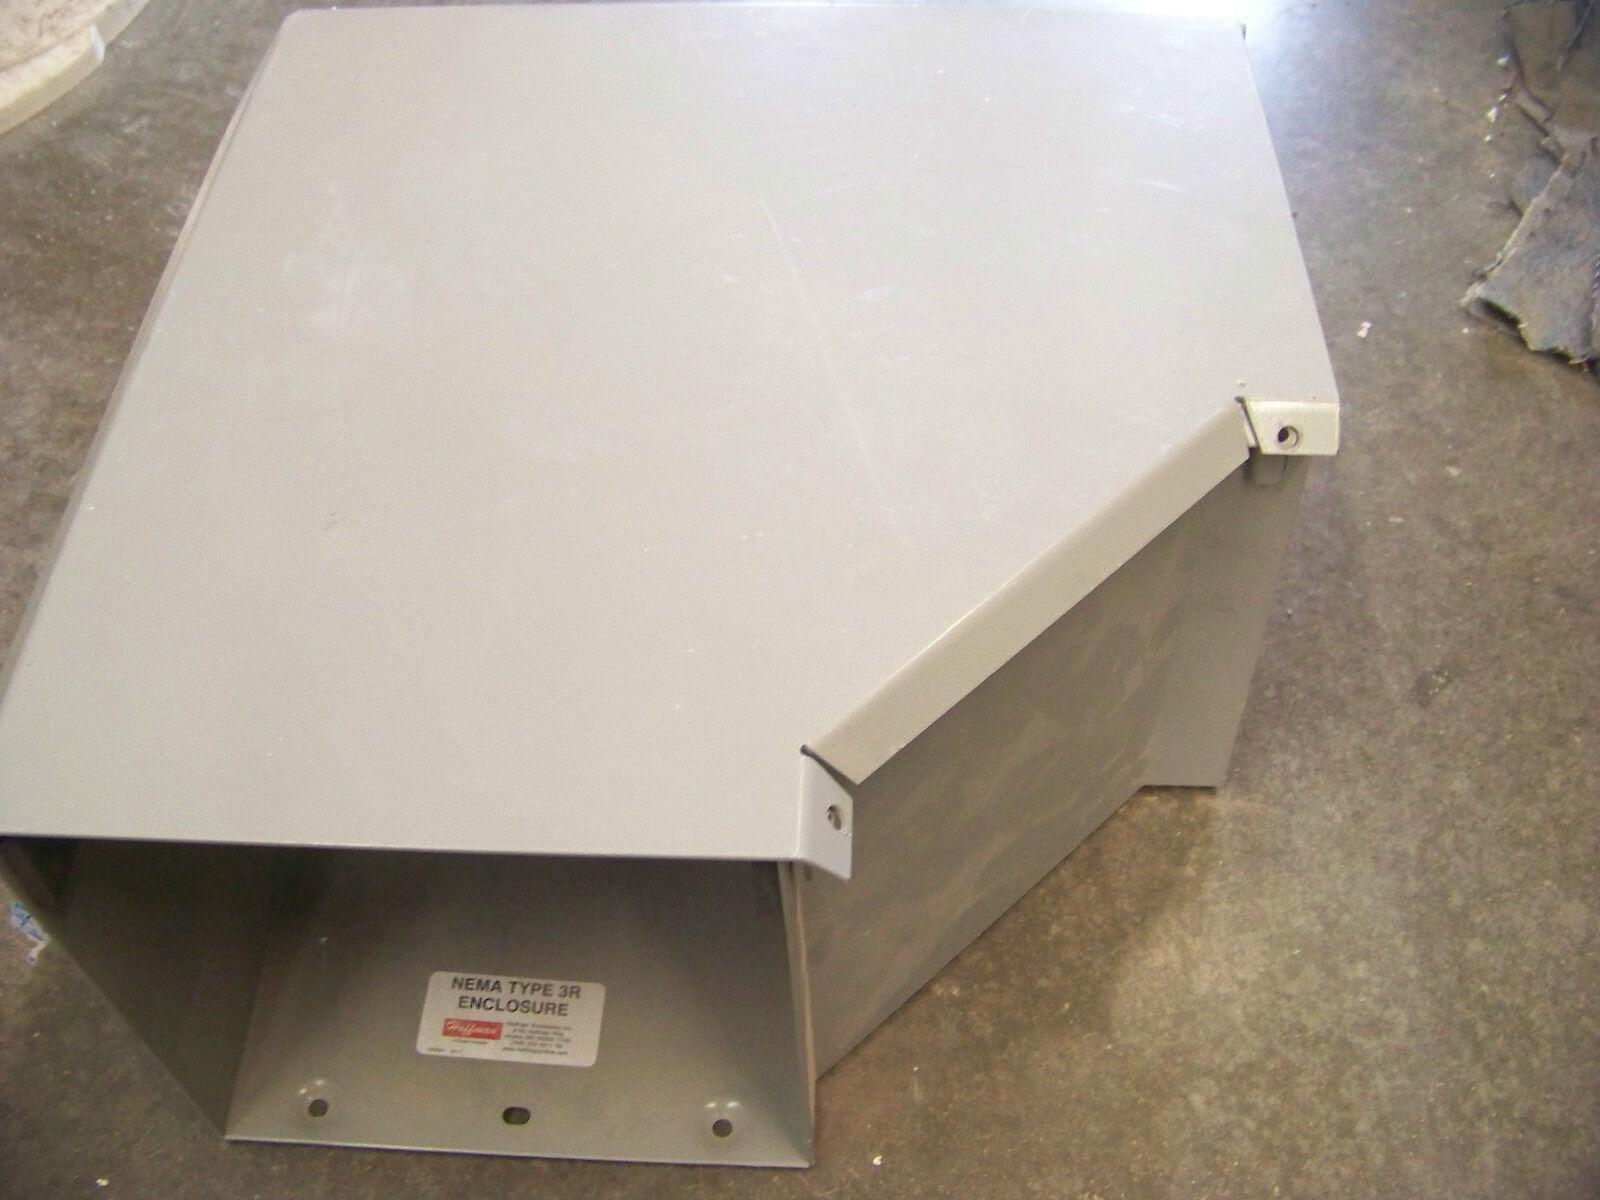 Hoffman Nema 3r Wiring Trough Solutions 1 F88t3r90e 8 X 90 Degree Elbow Section